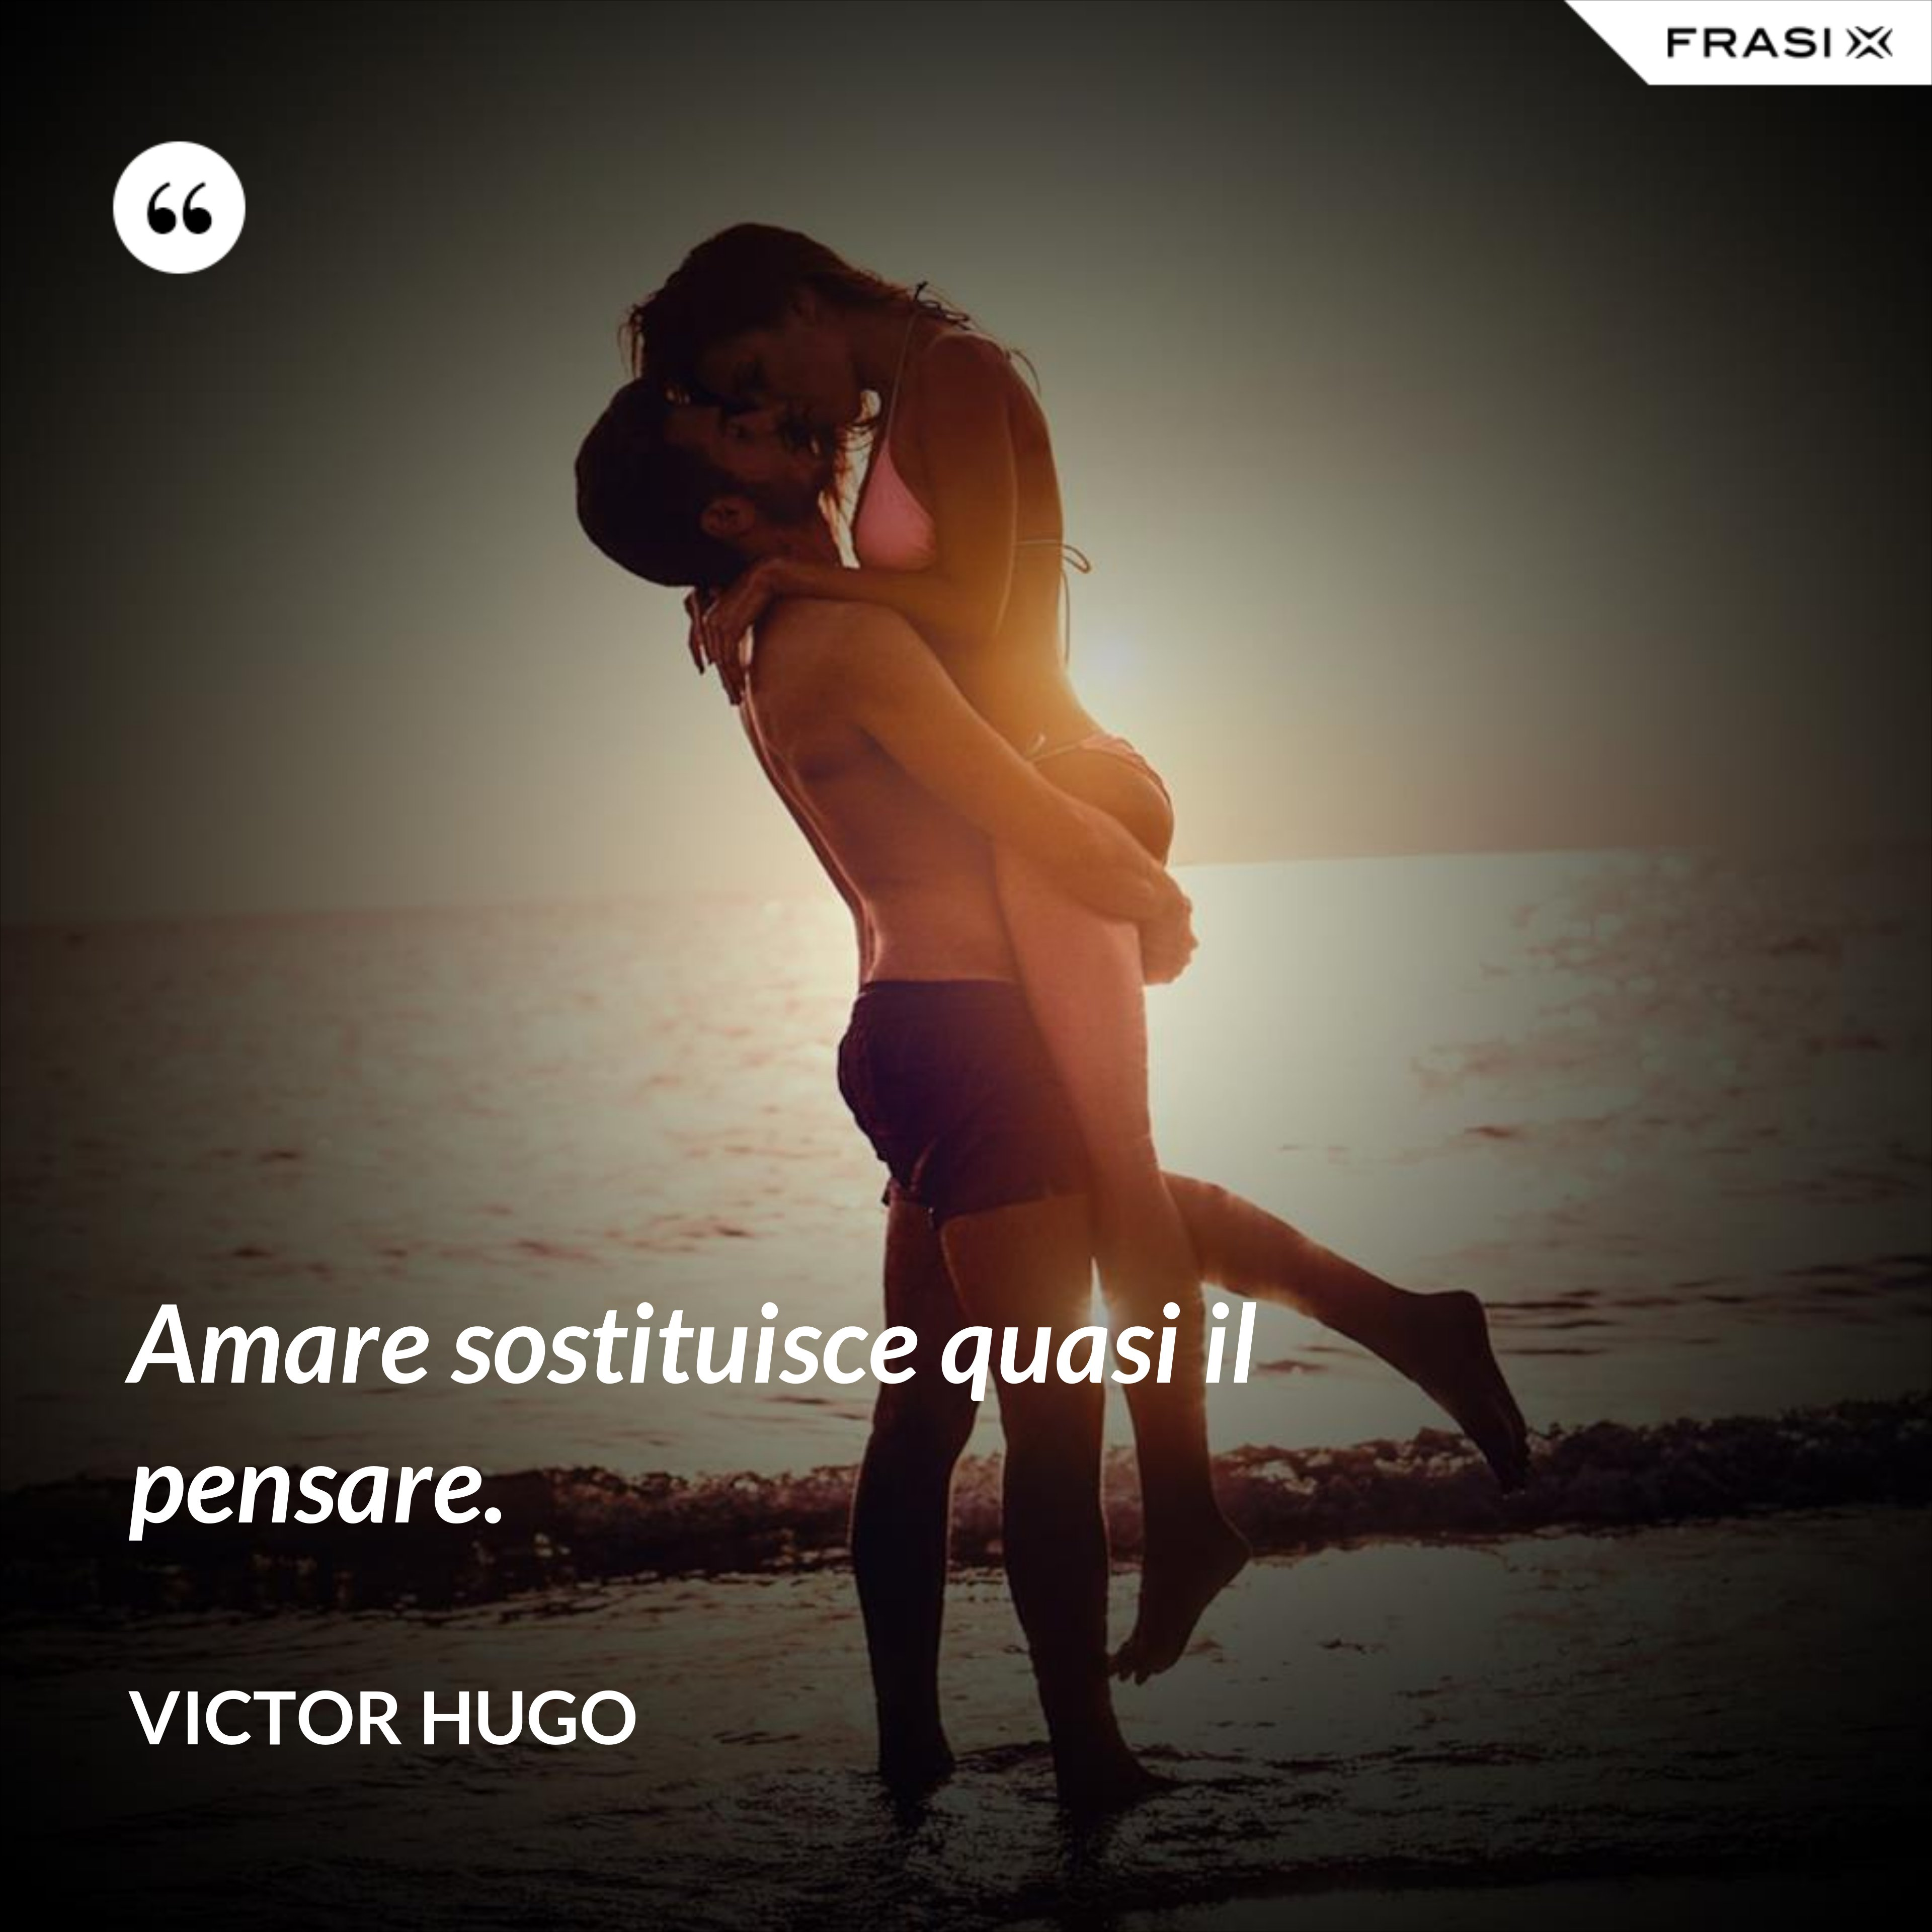 Amare sostituisce quasi il pensare. - Victor Hugo